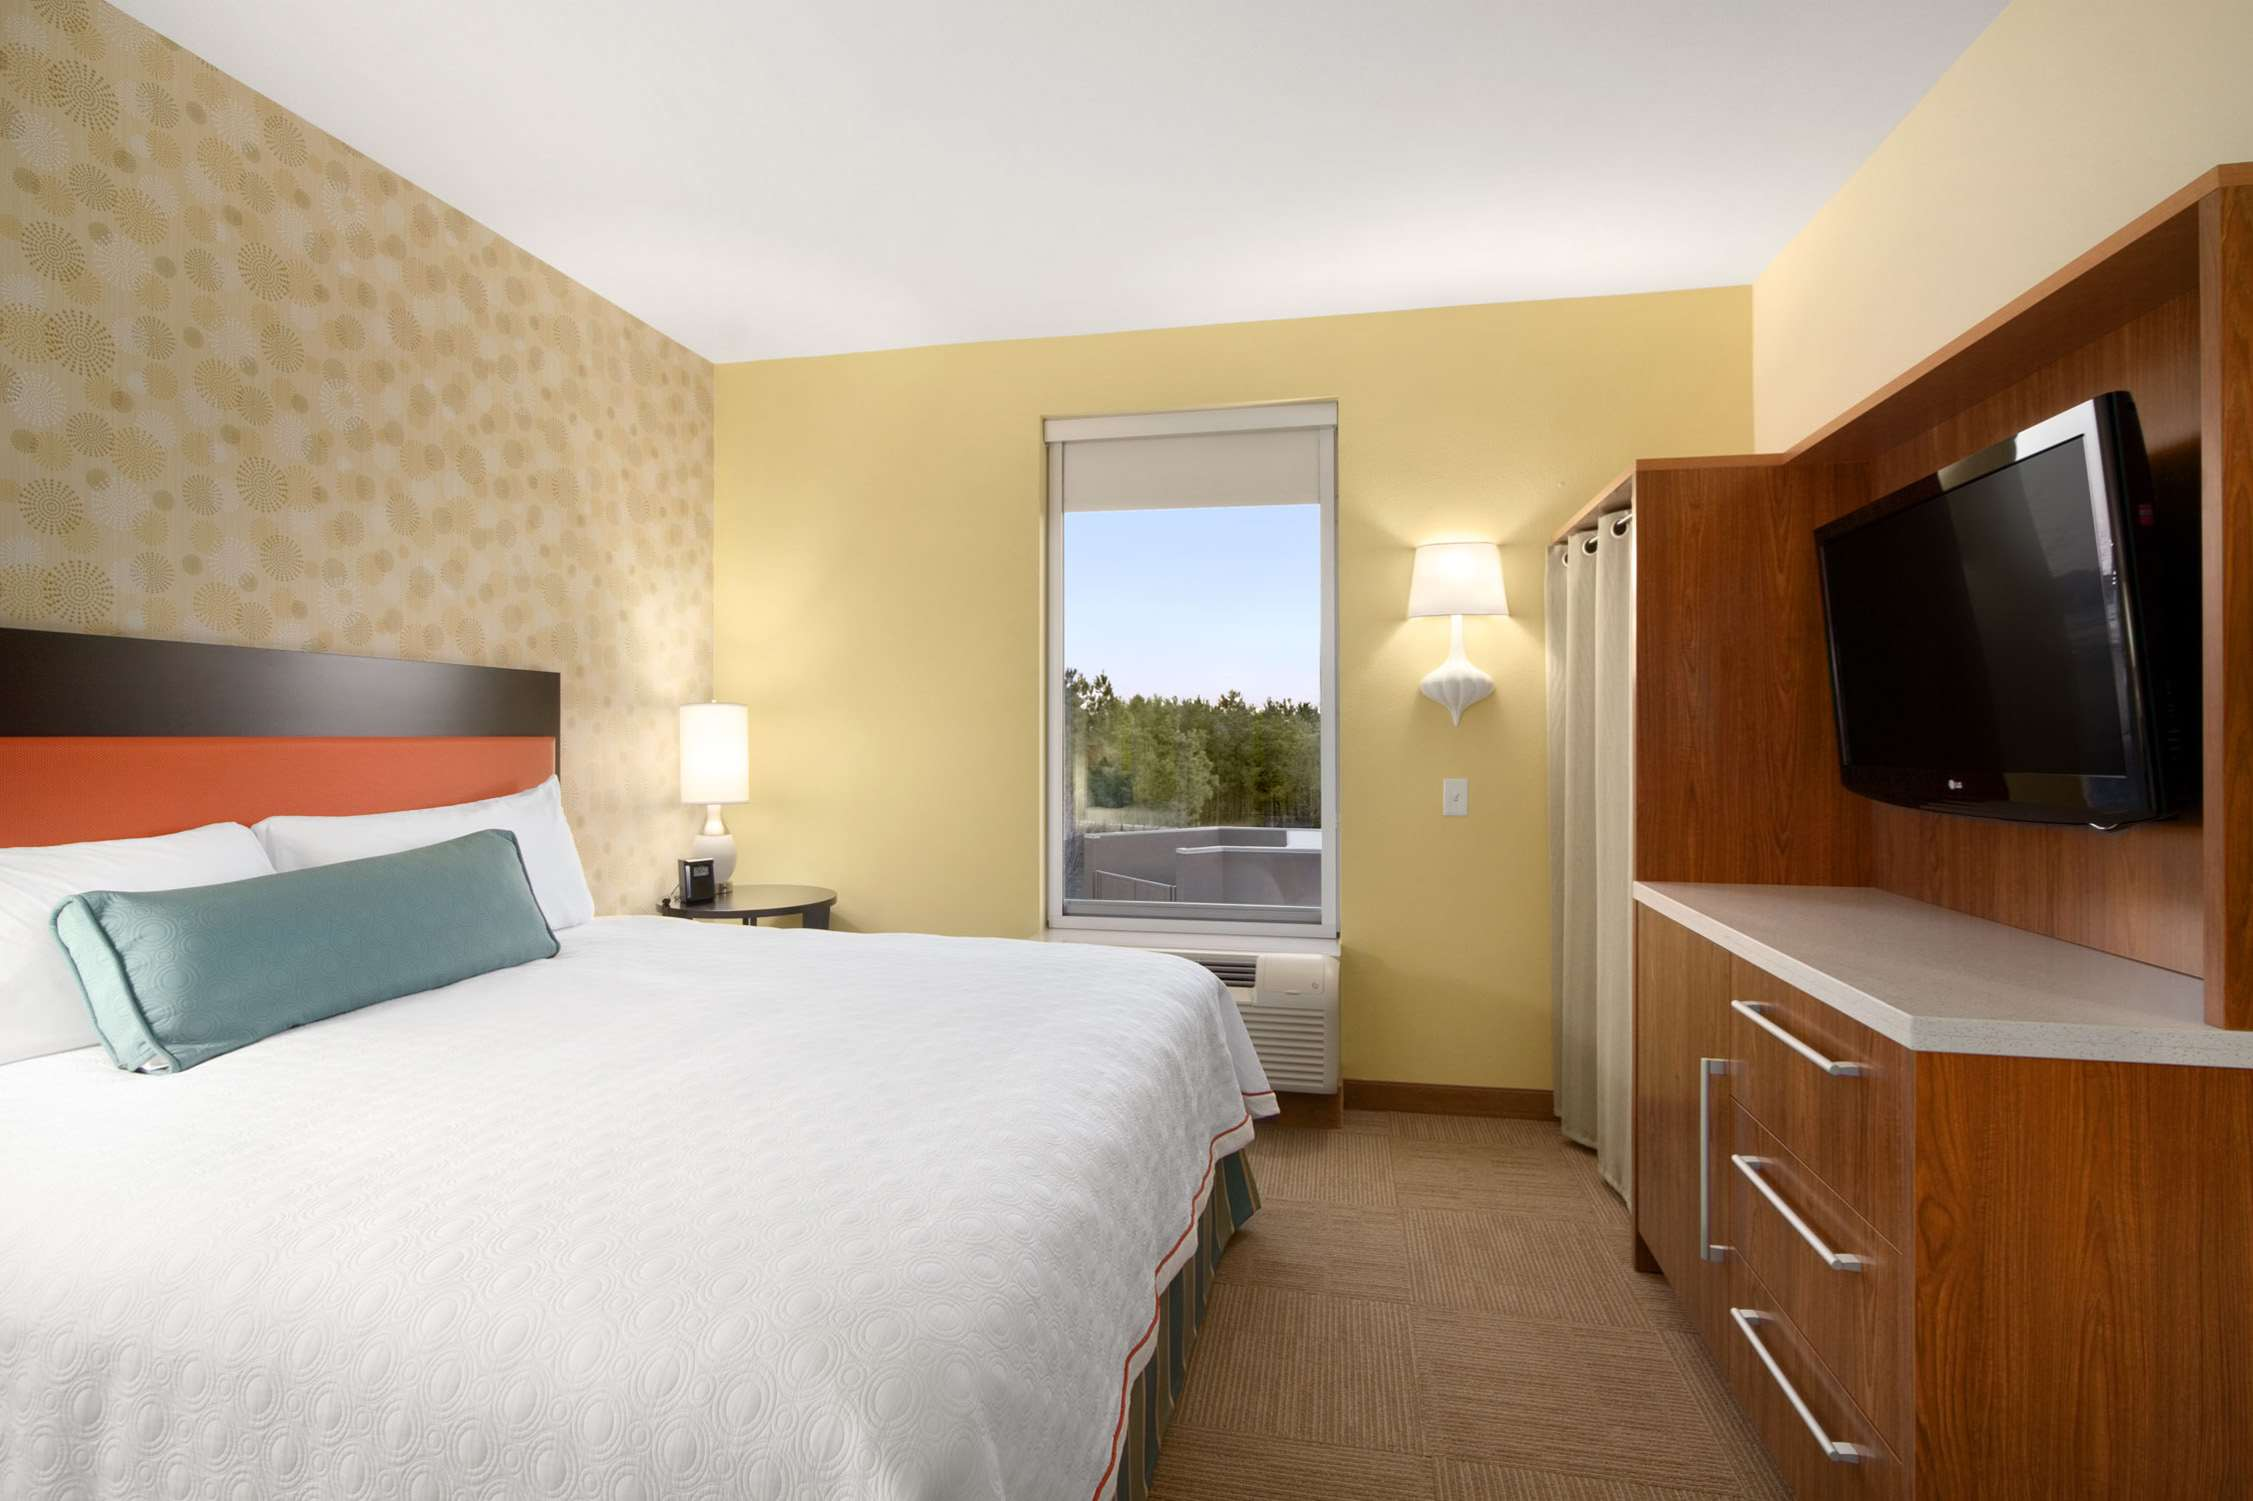 Home2 Suites by Hilton Fayetteville, NC image 2